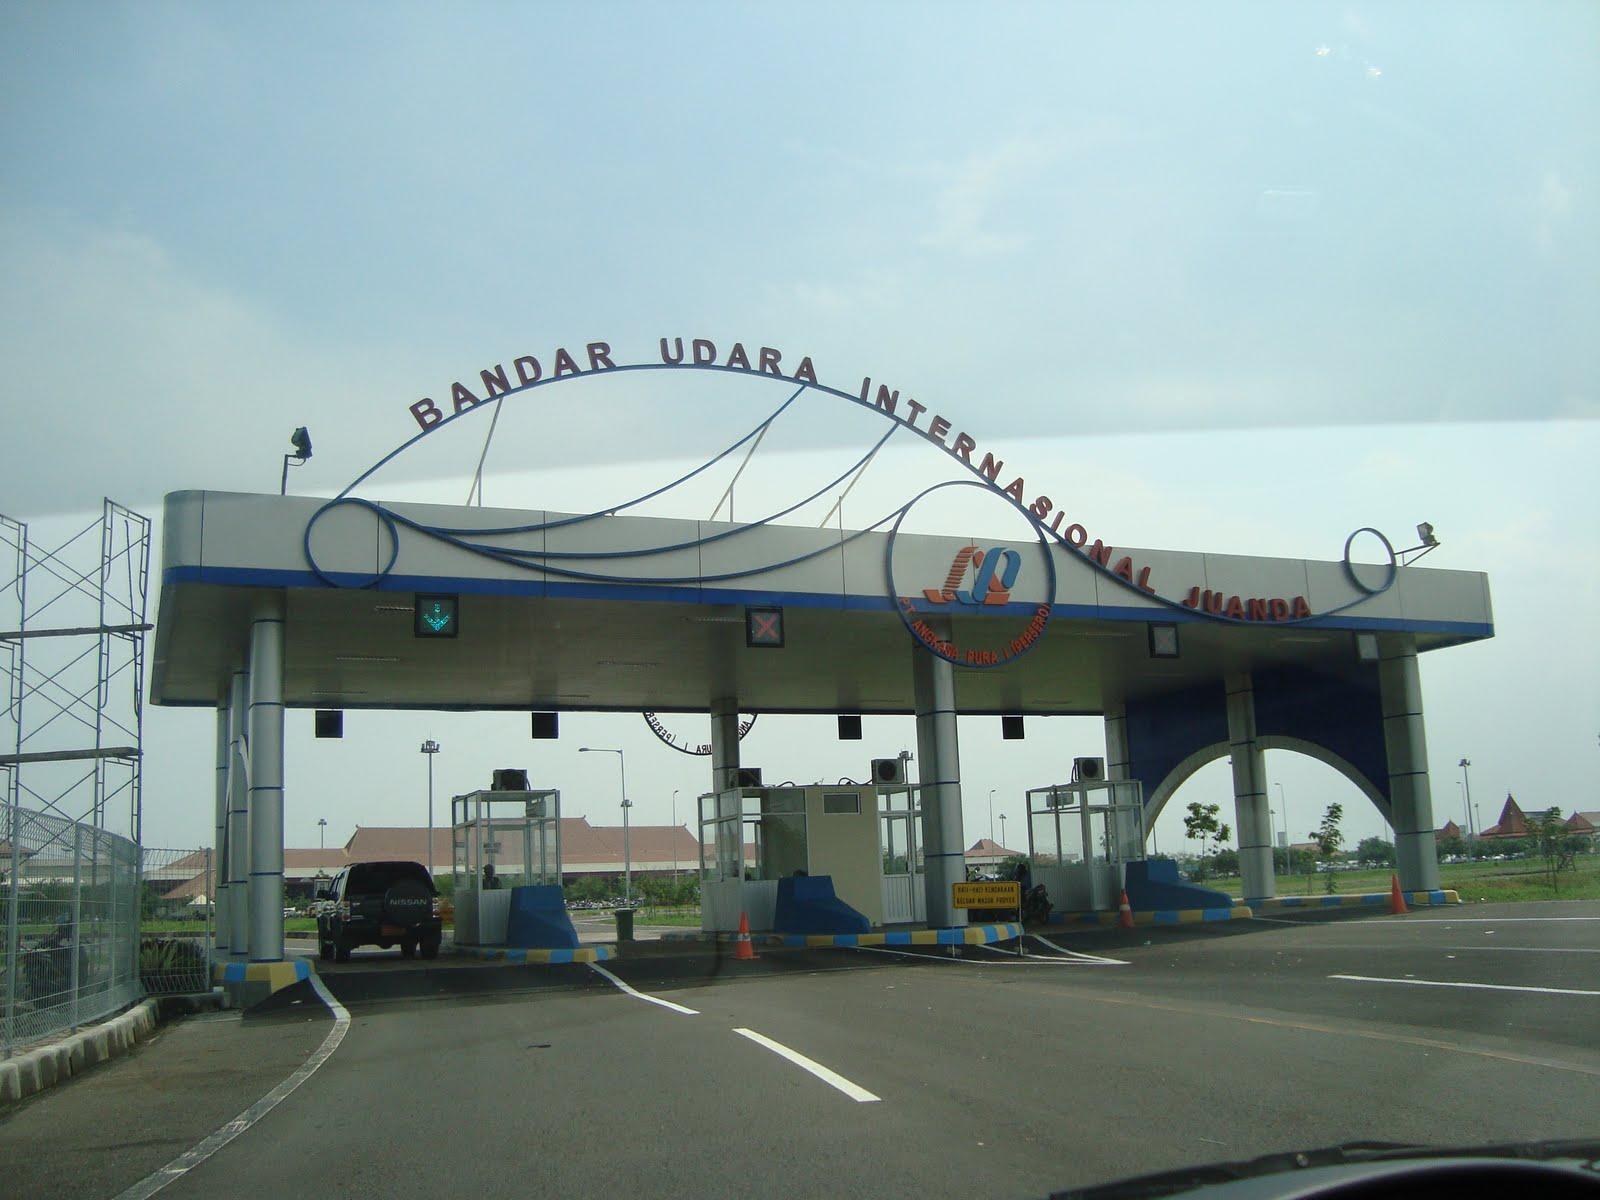 Surabaya Juanda Airport Guide - Sleeping in Airports